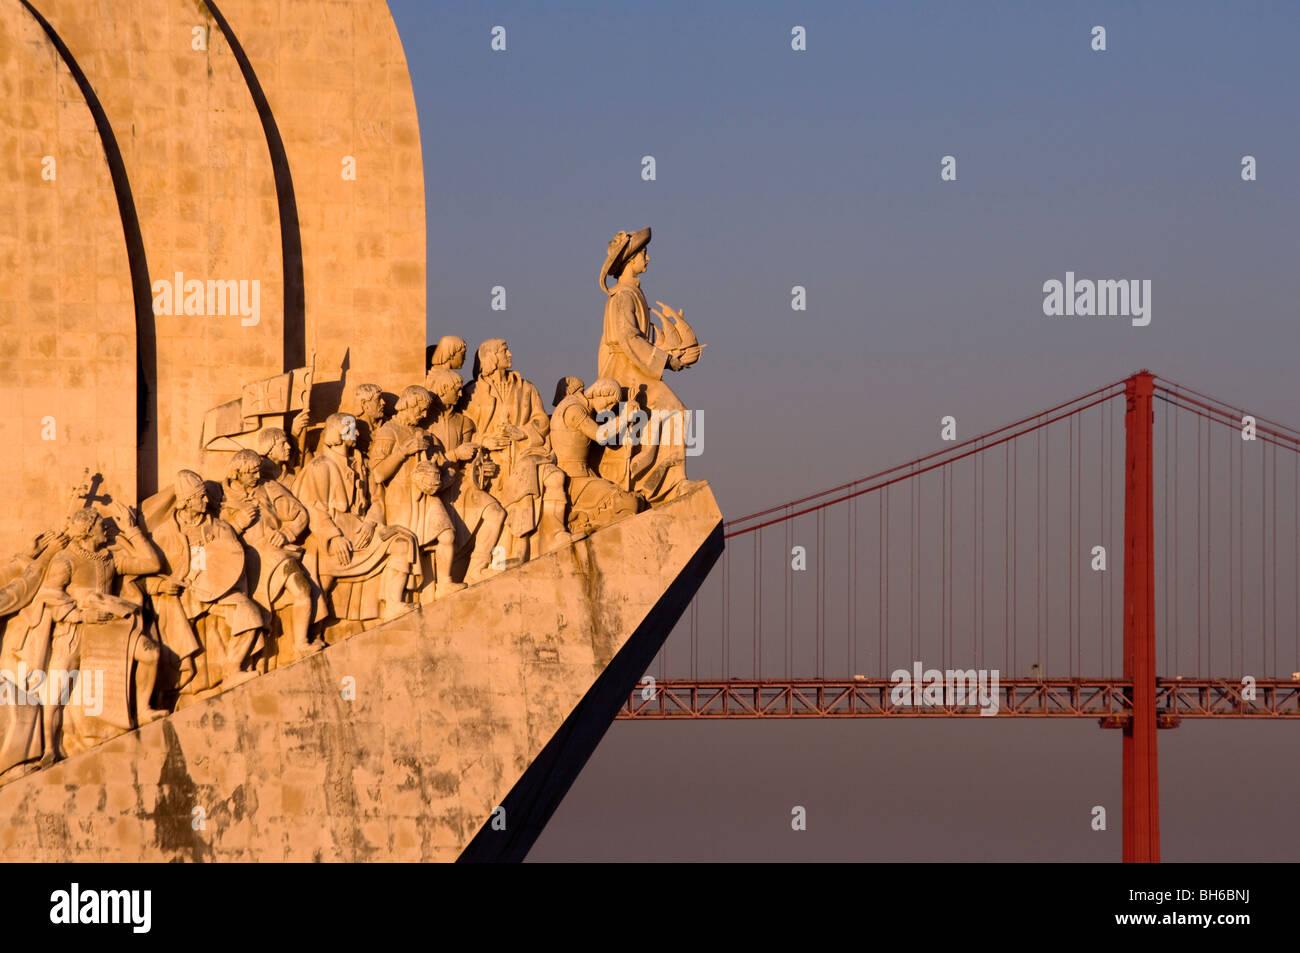 Denkmal der Entdeckungen und Hängebrücke, Lissabon, Portugal Stockbild